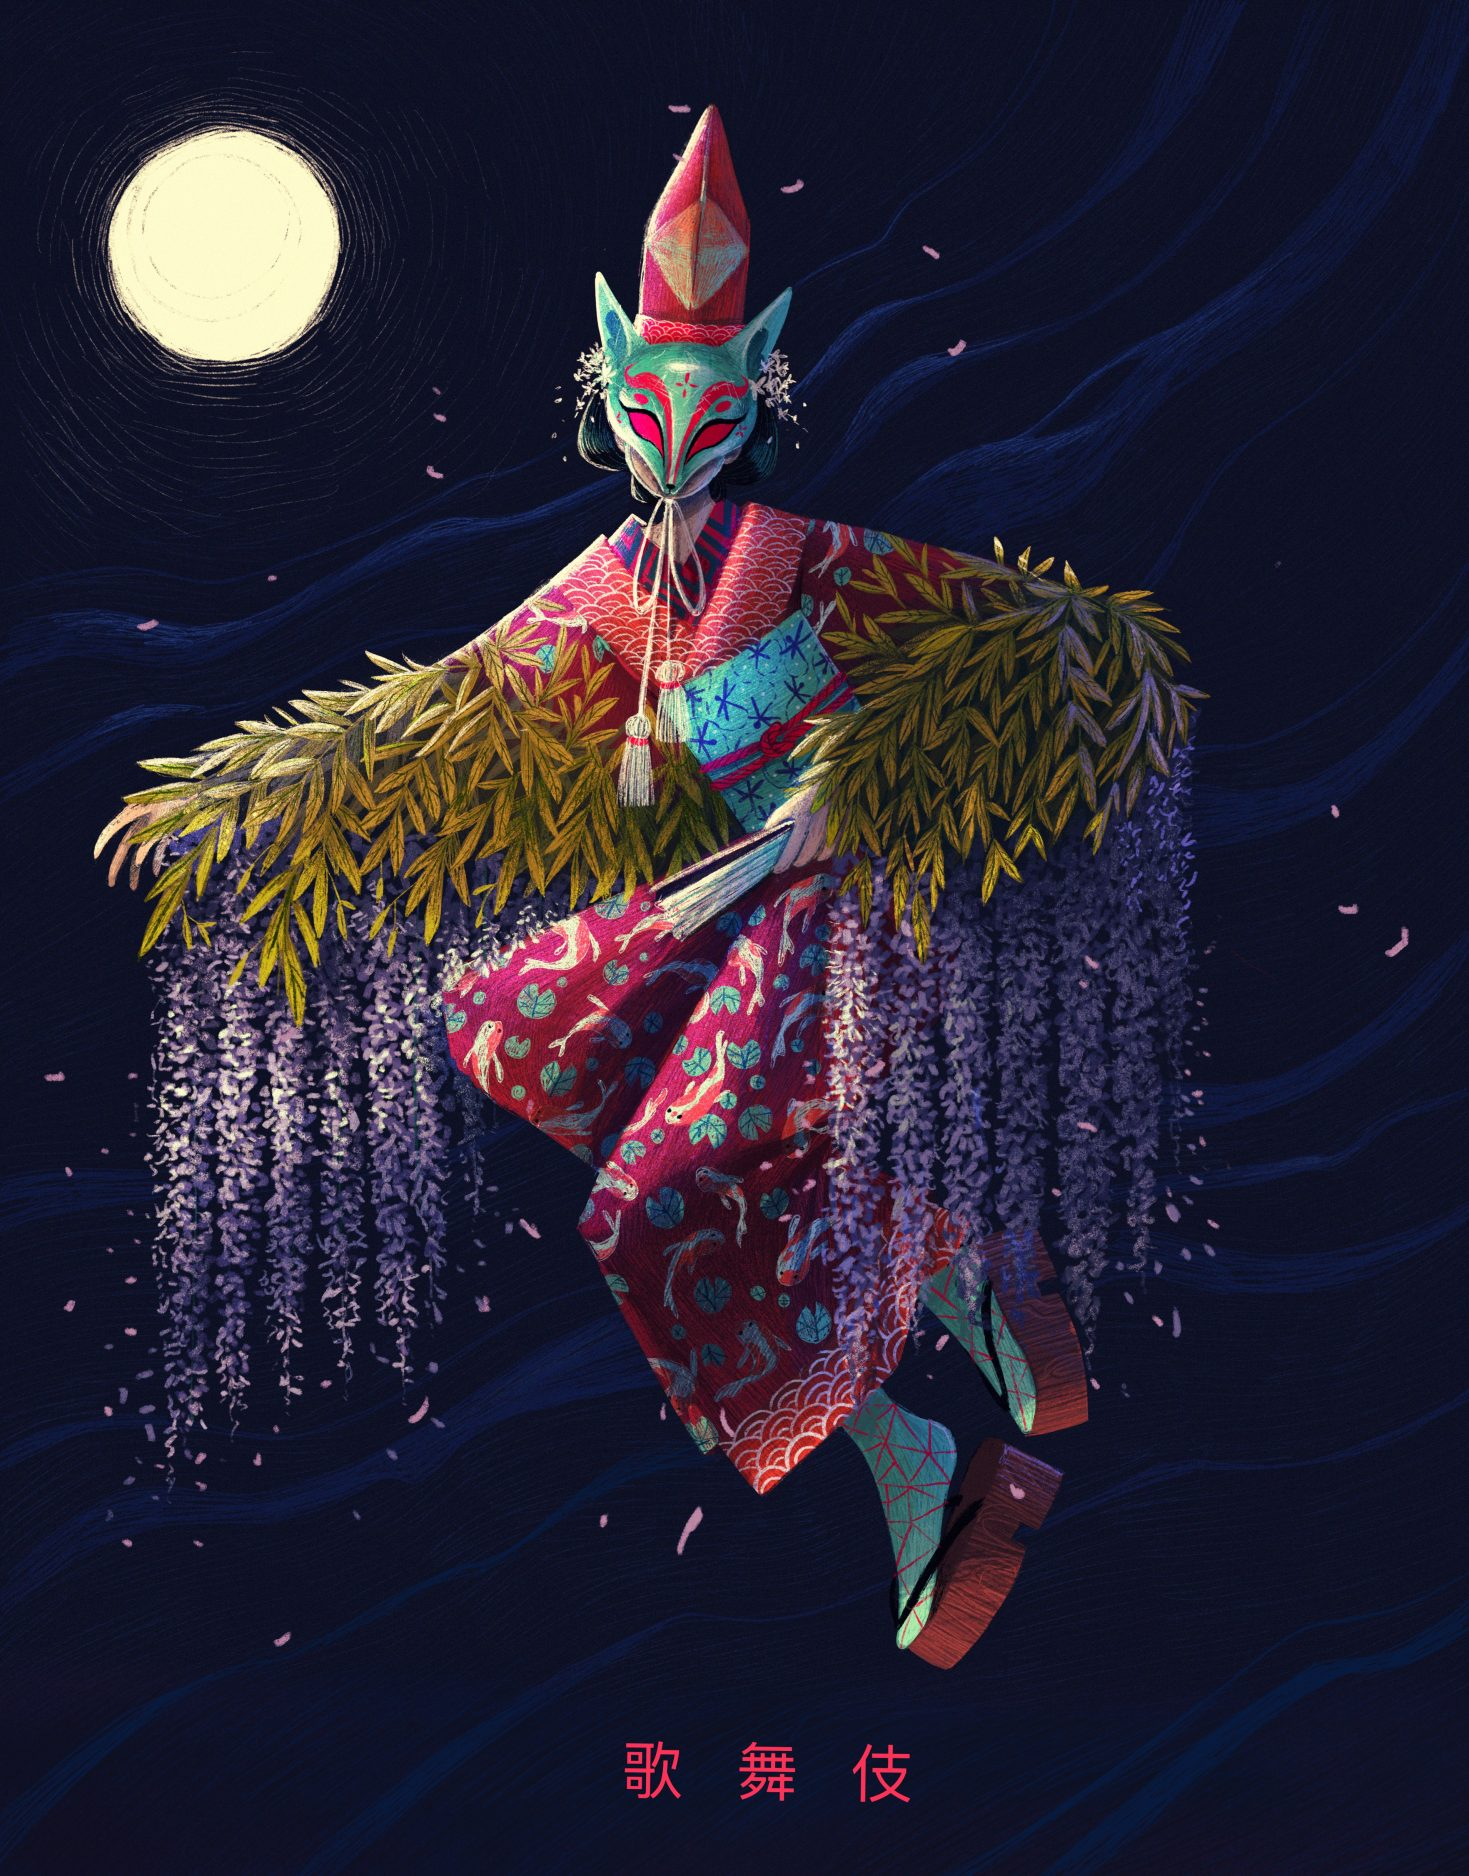 kabuki-character-design-challenge